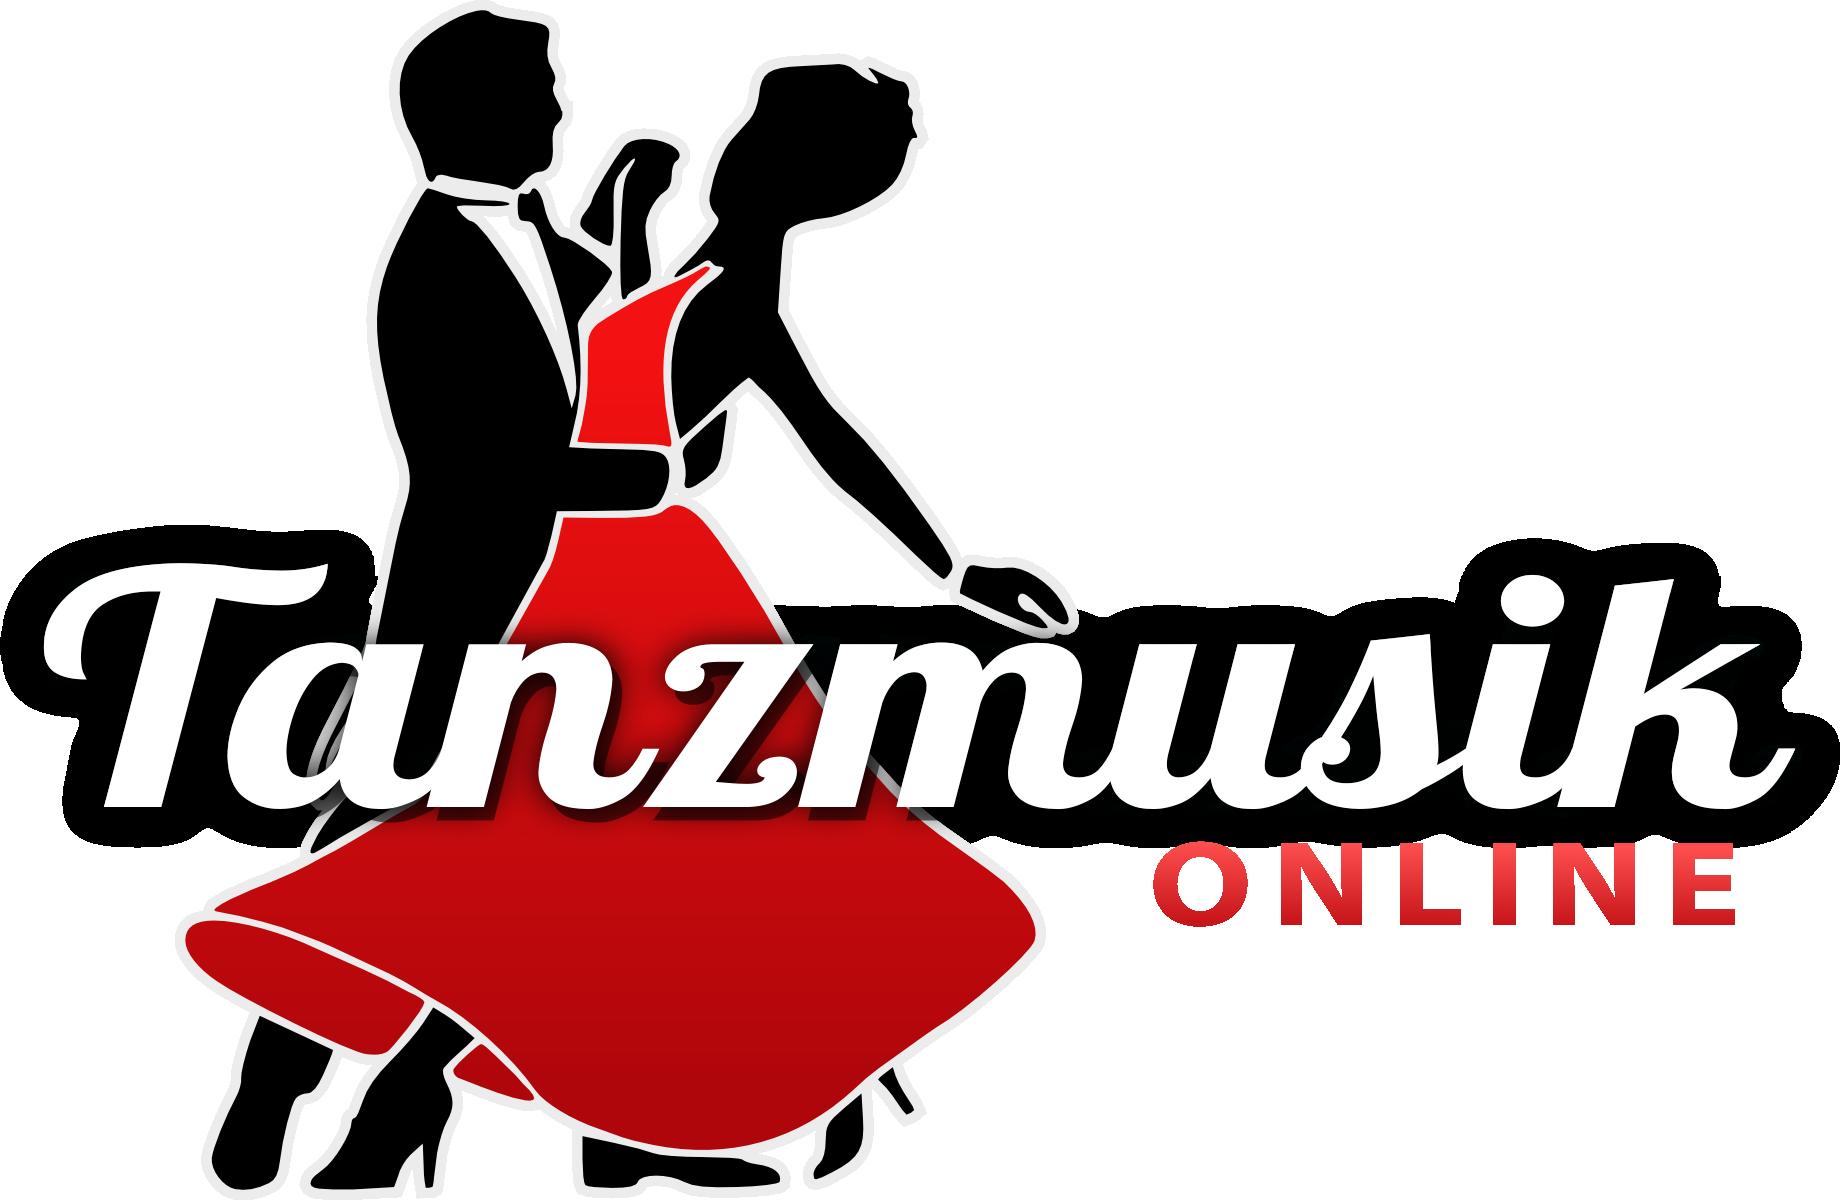 Sportfreunde Stiller Das Geschenk Tanzmusik Online De Tanzmusik Tanz Musik Musik